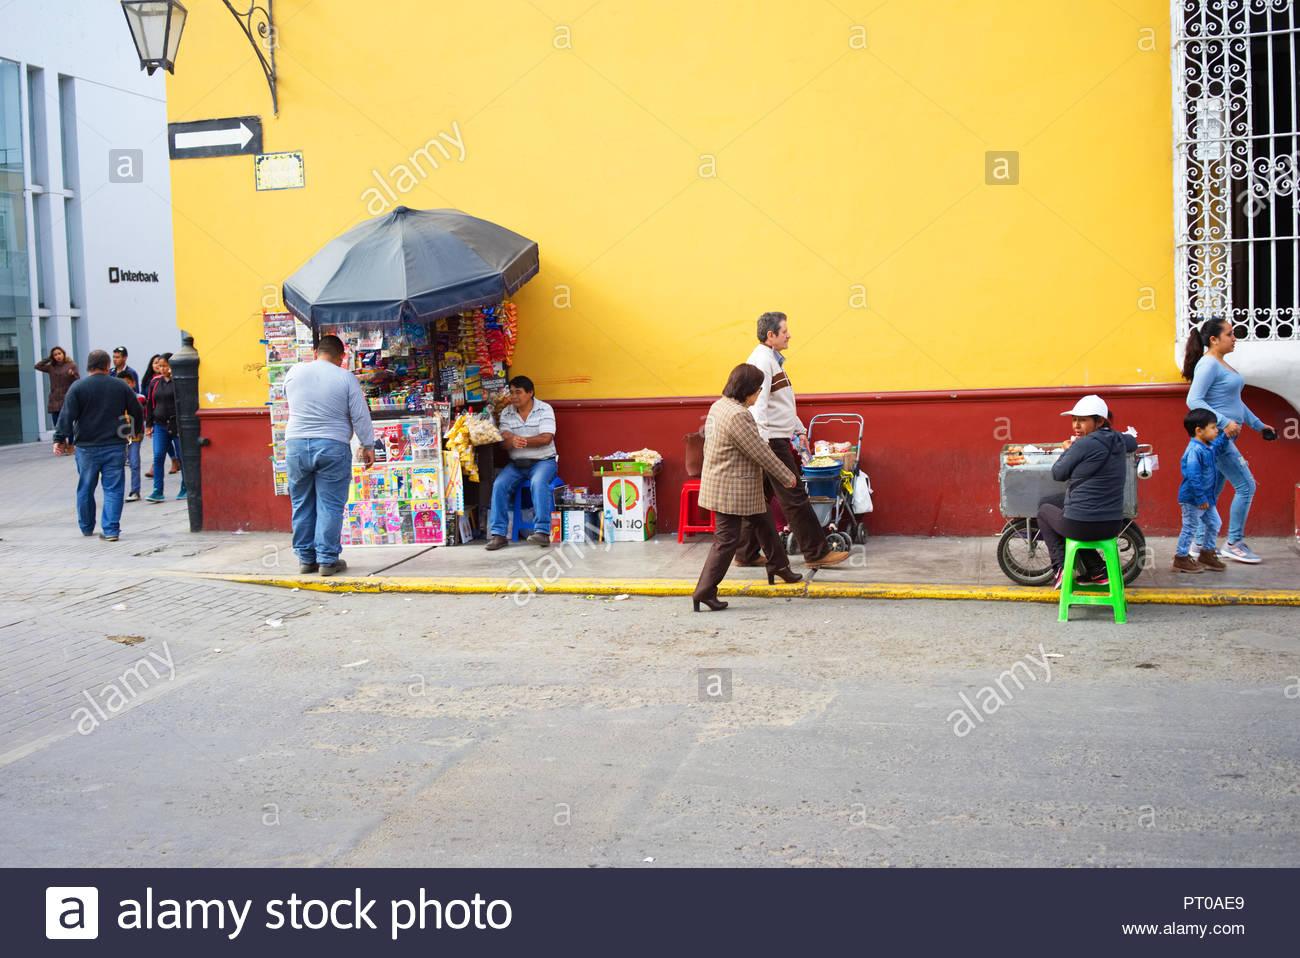 street seller in Trujillo Peru - Stock Image